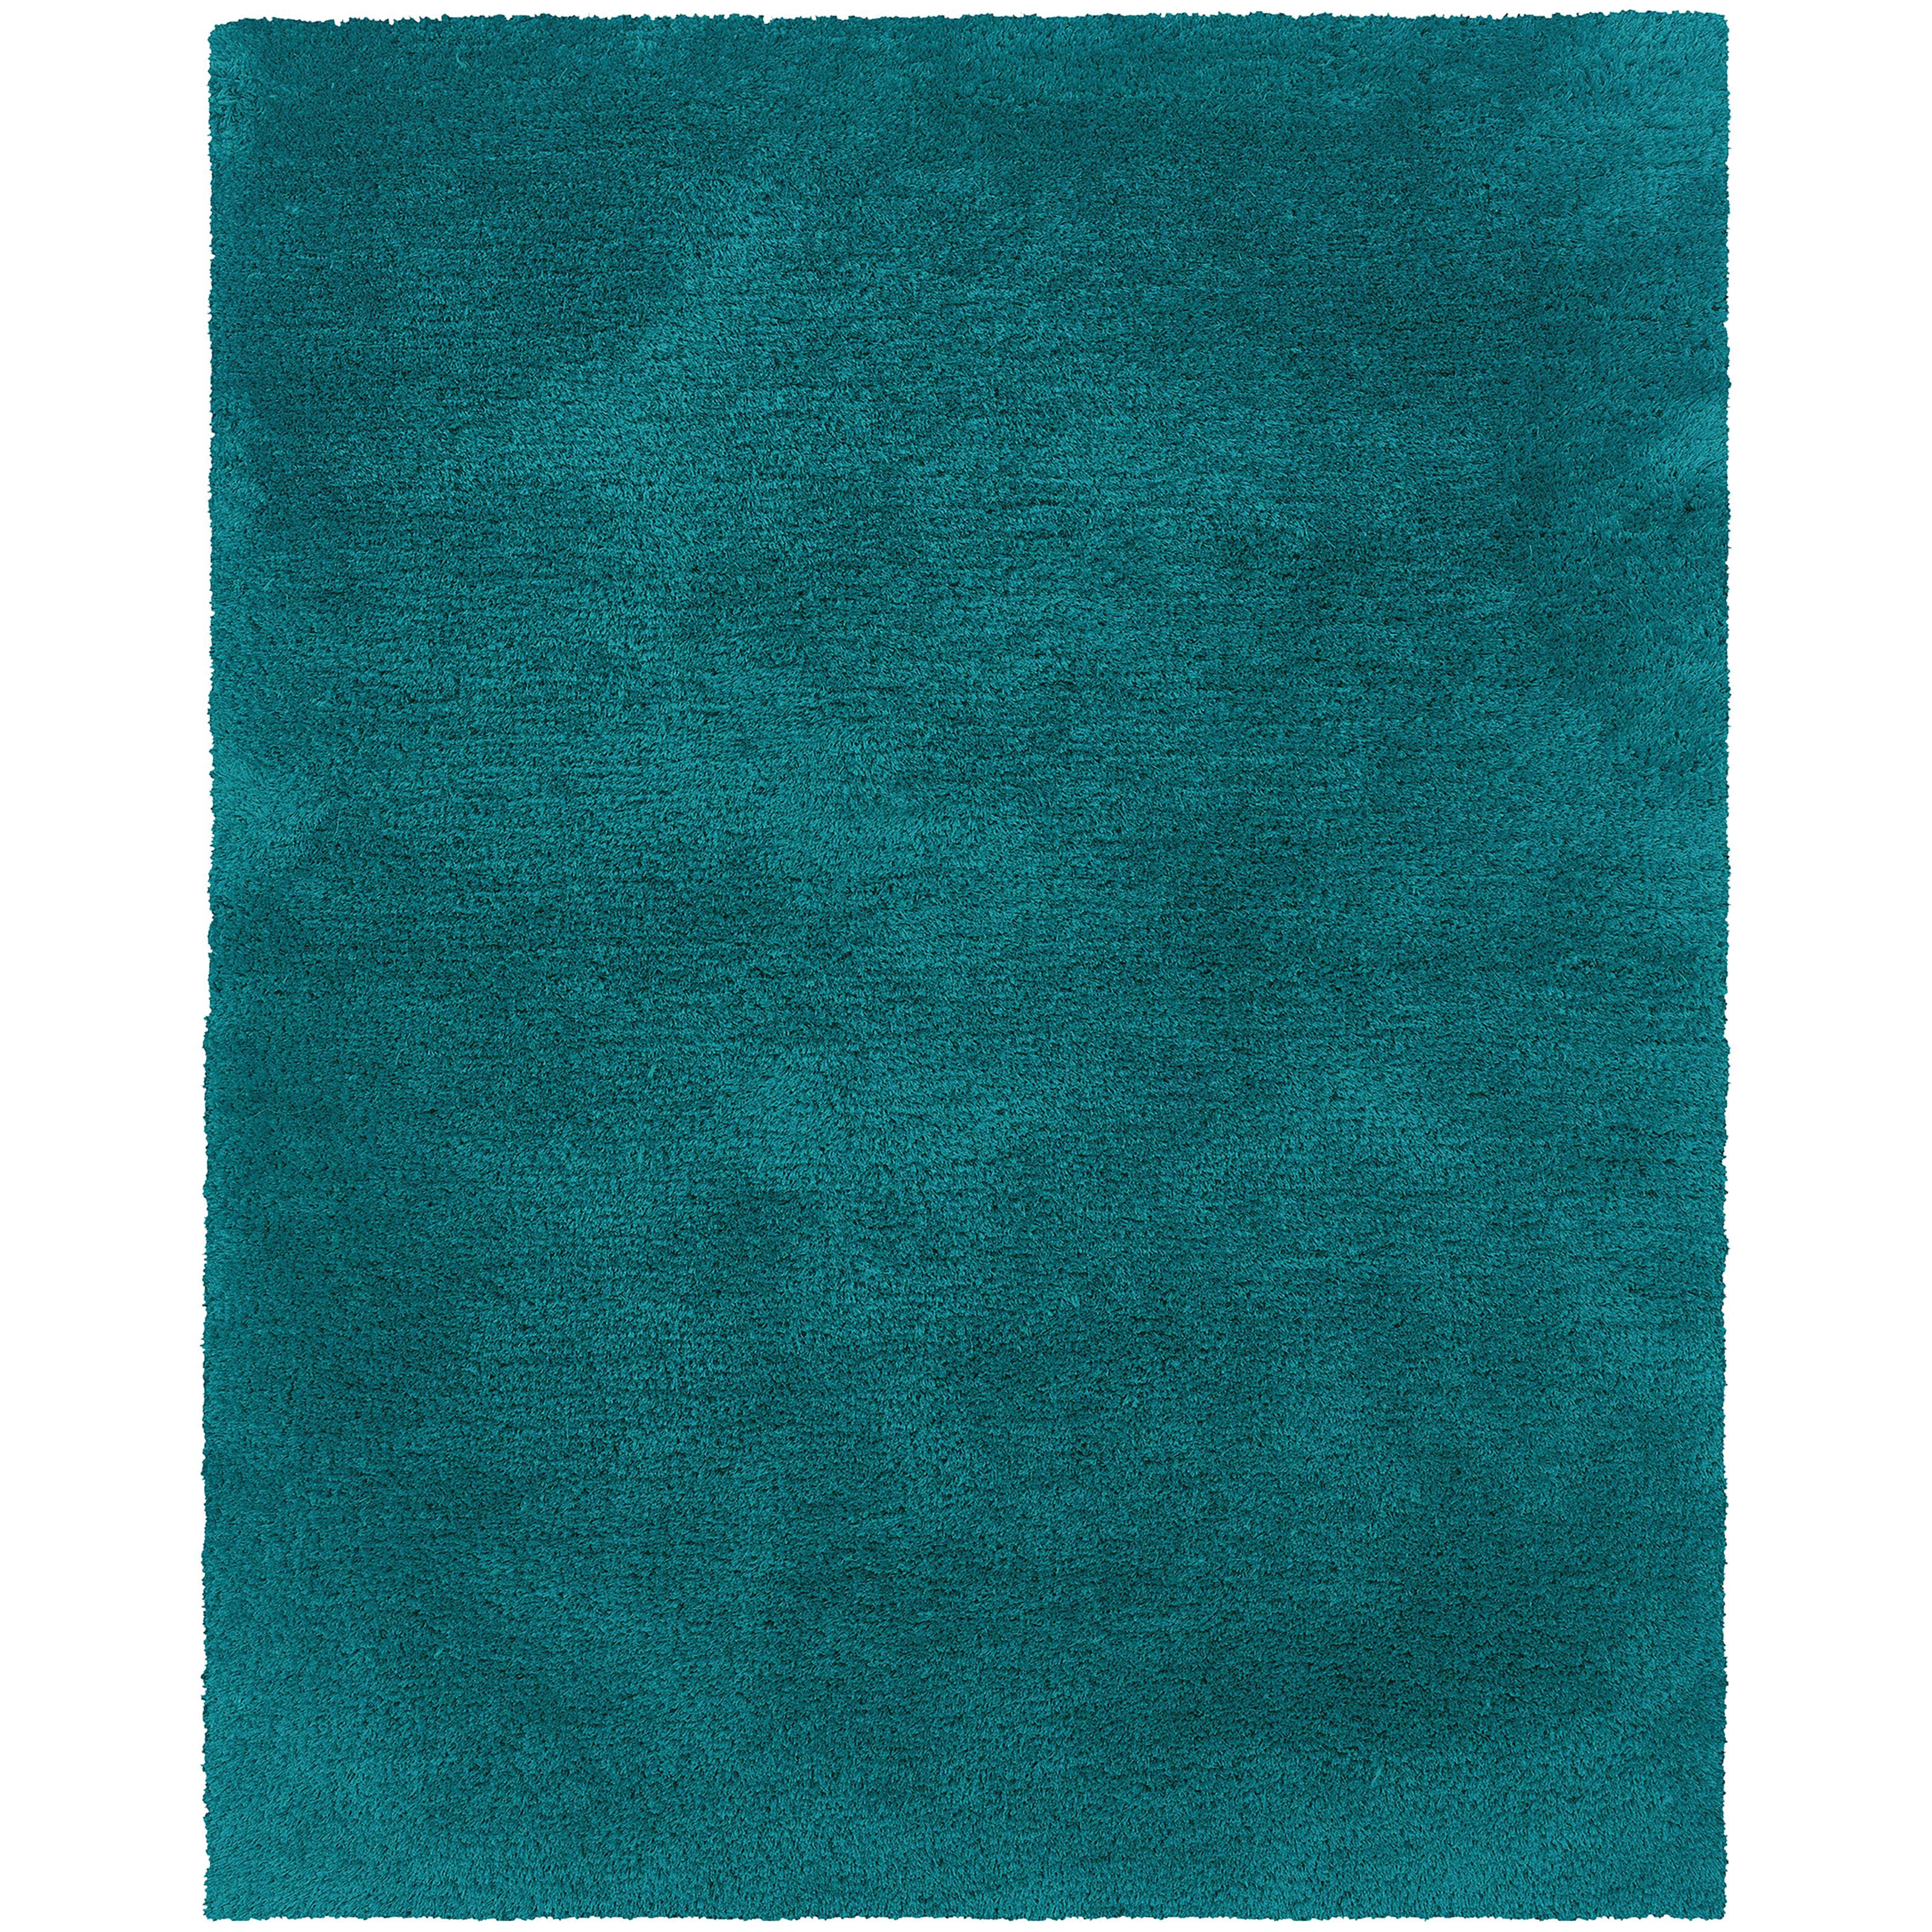 "Oriental Weavers Cosmo 10' 0"" X 13' 0"" Rug - Item Number: C81104305396ST"